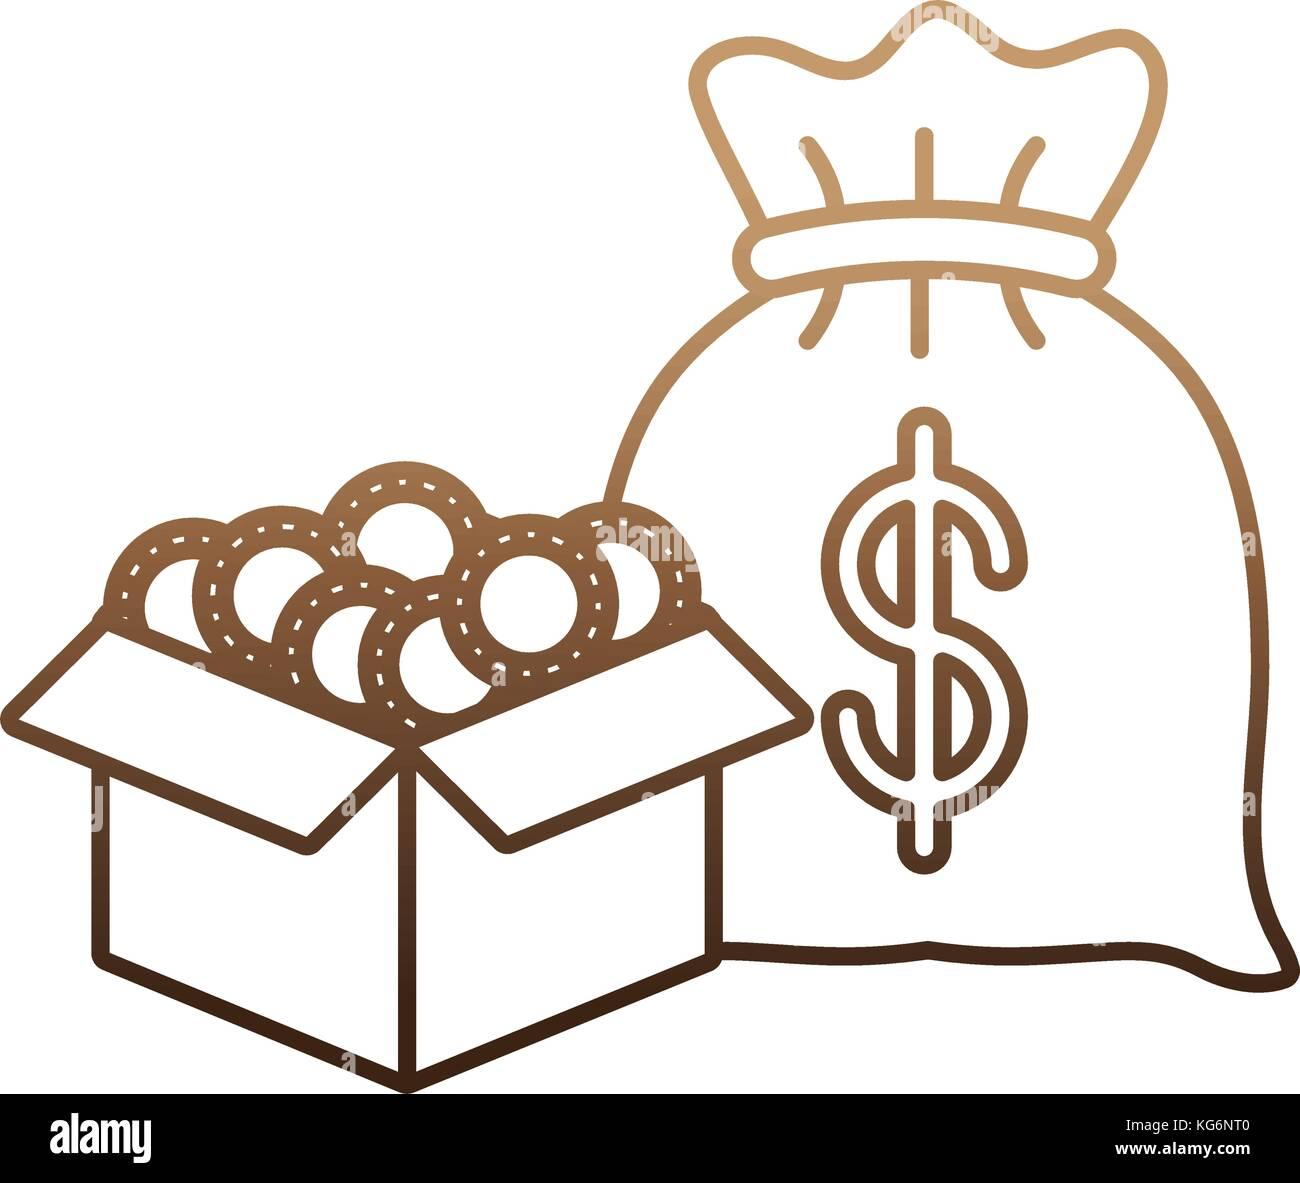 money sack icon - Stock Image